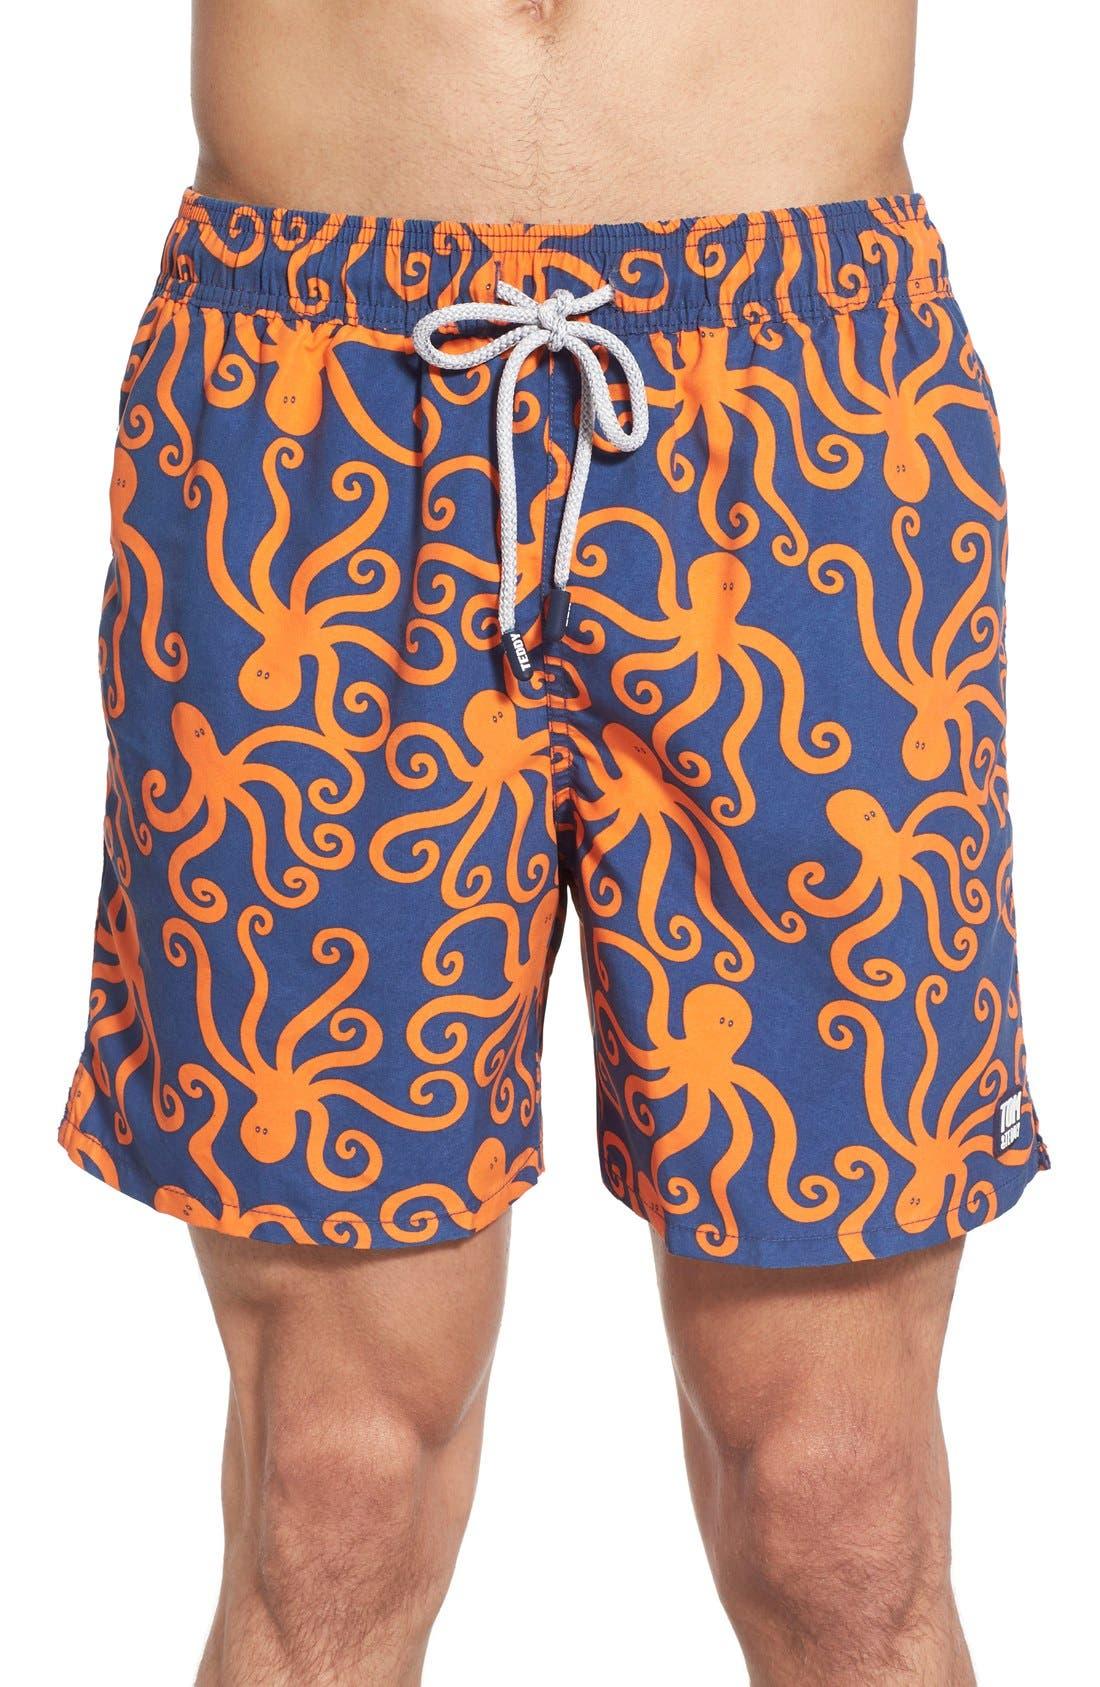 Tom & Teddy 'Octopus Pattern' Swim Trunks